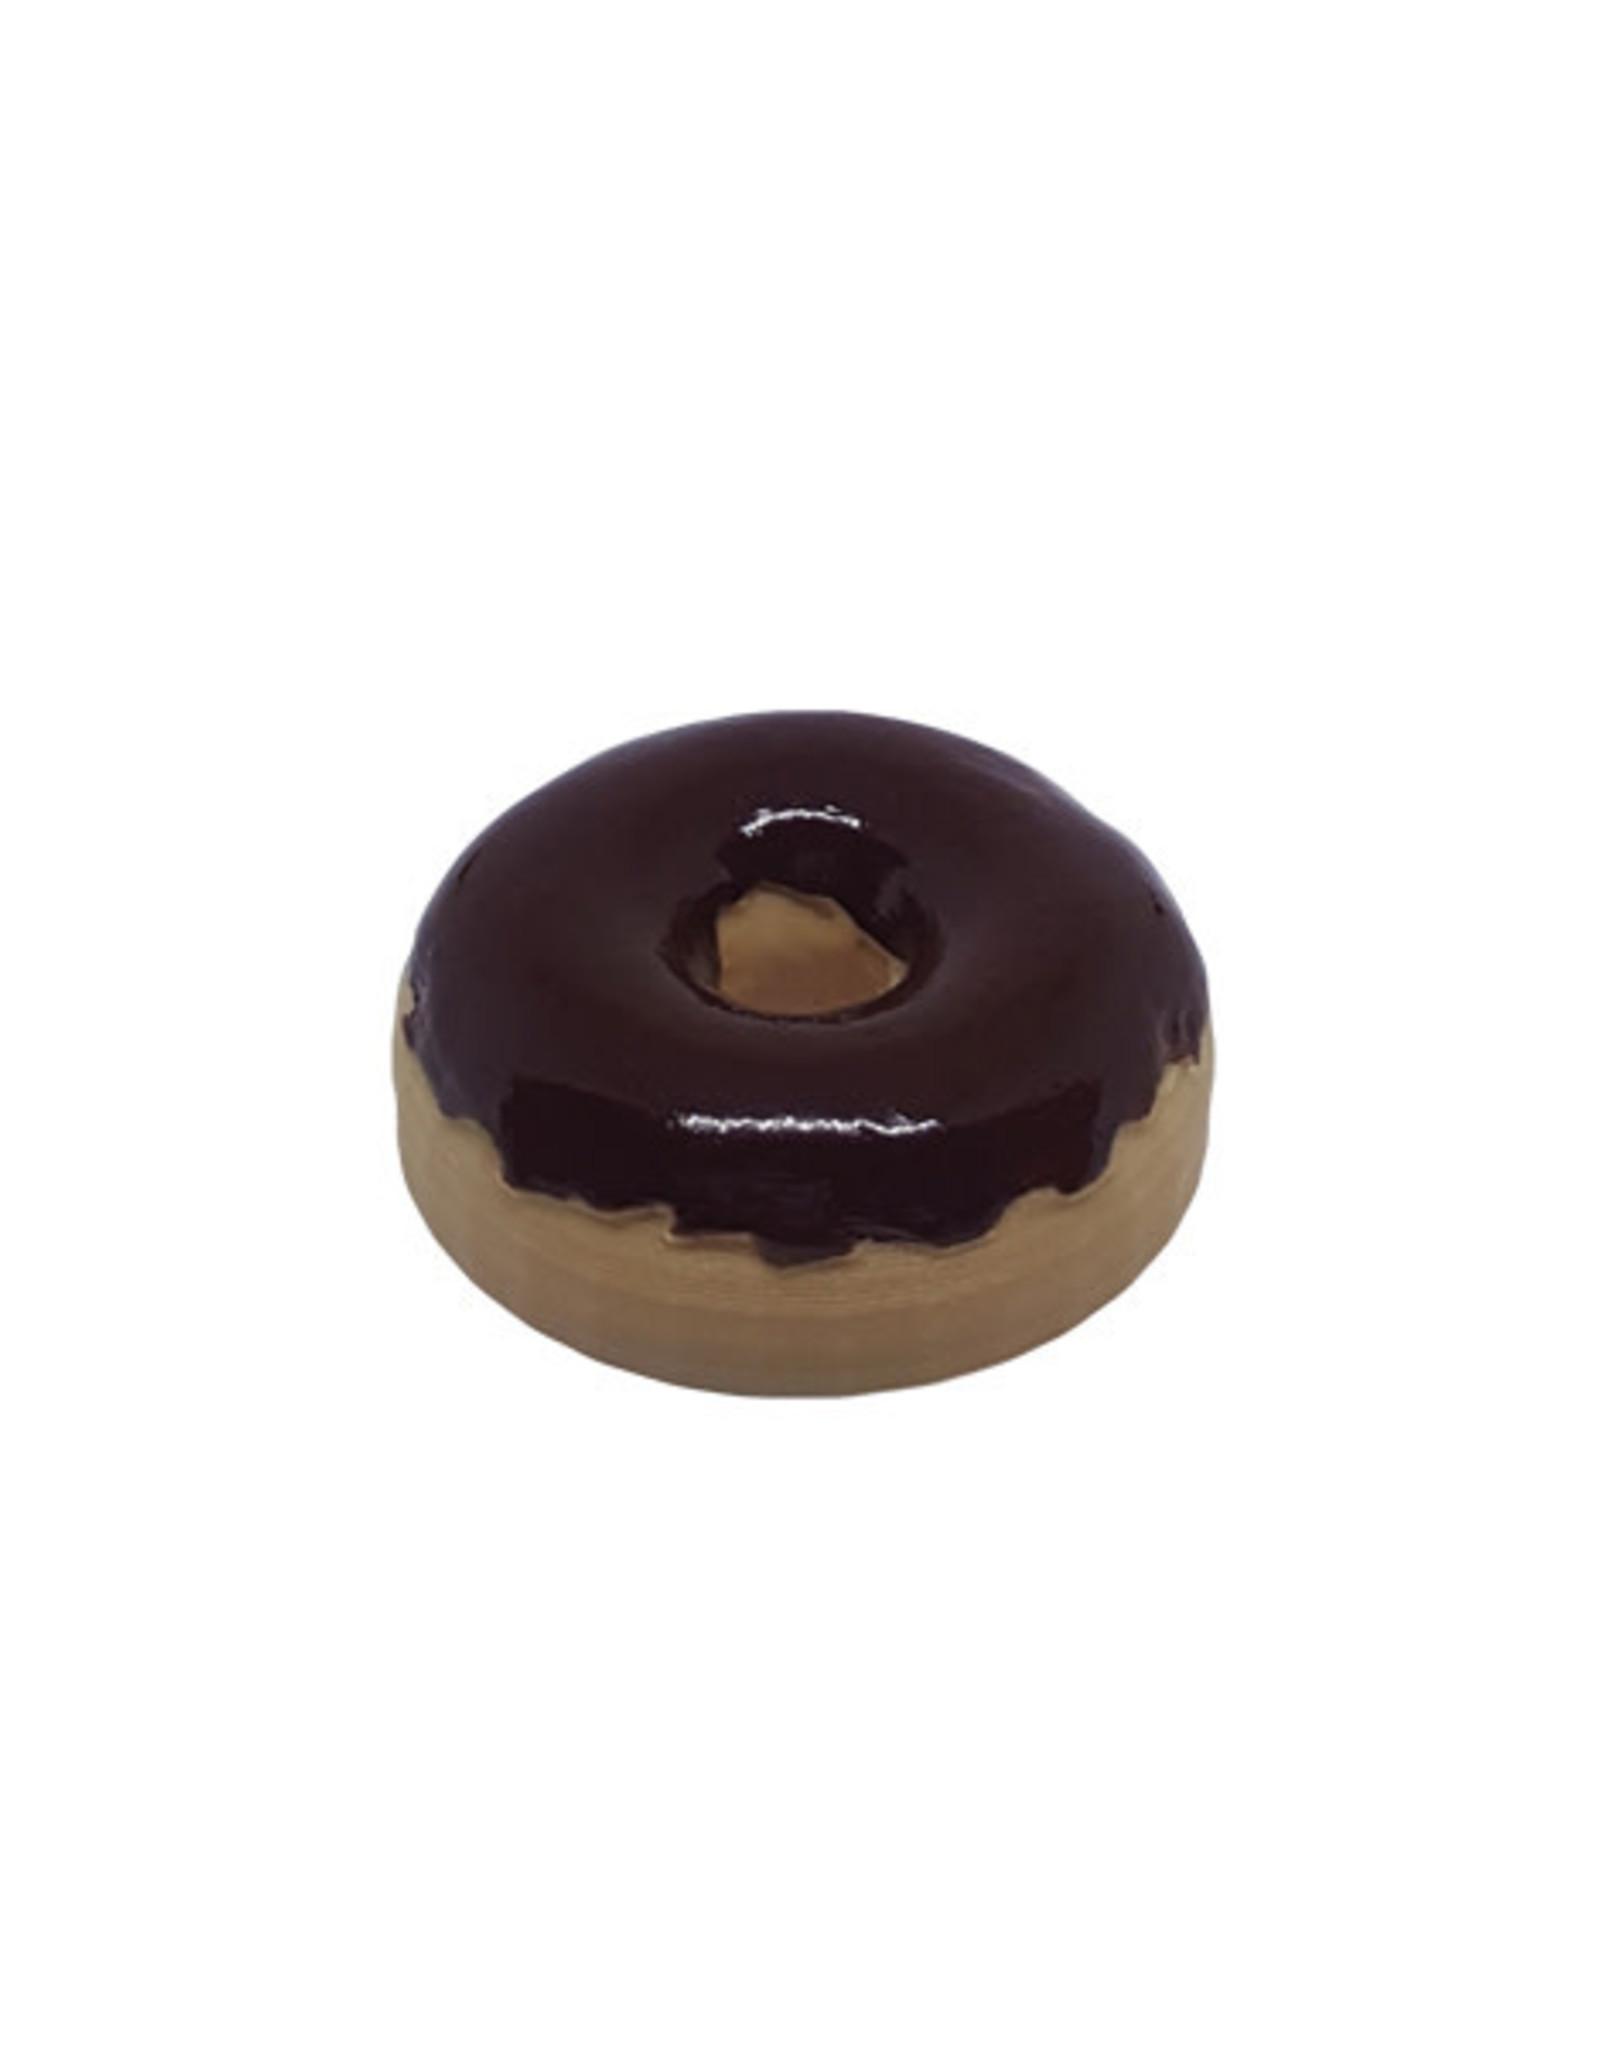 45 adapter donut chocolate glaze